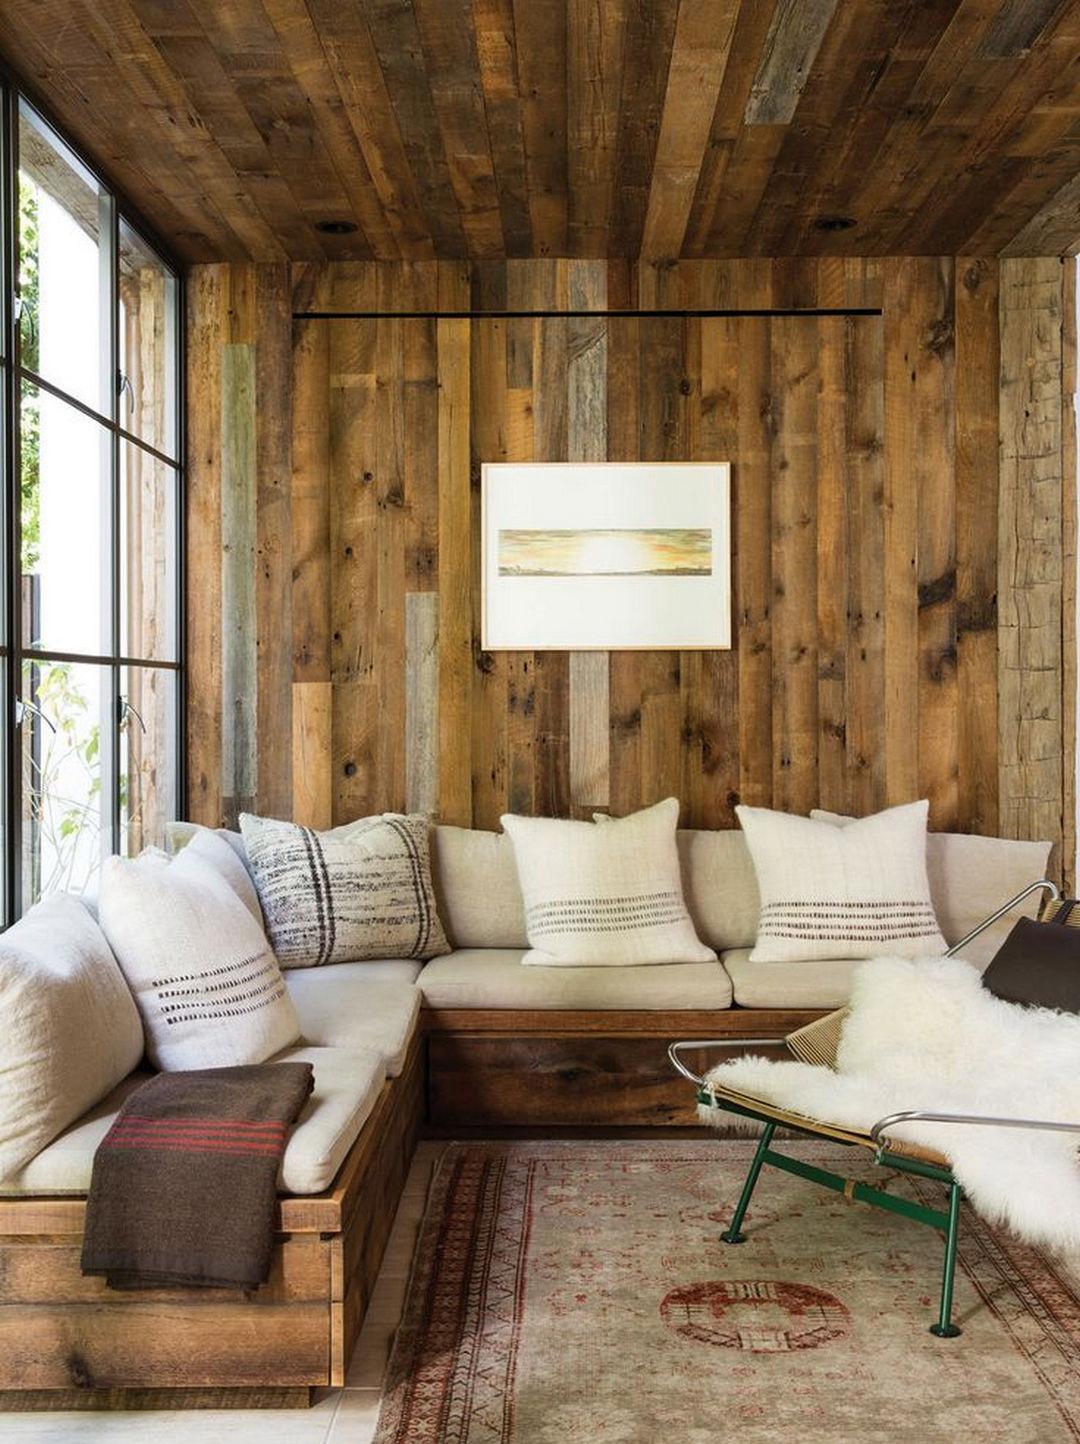 gorgeous rustic cabin interior ideas https futuristarchitecture also home casas rh ar pinterest